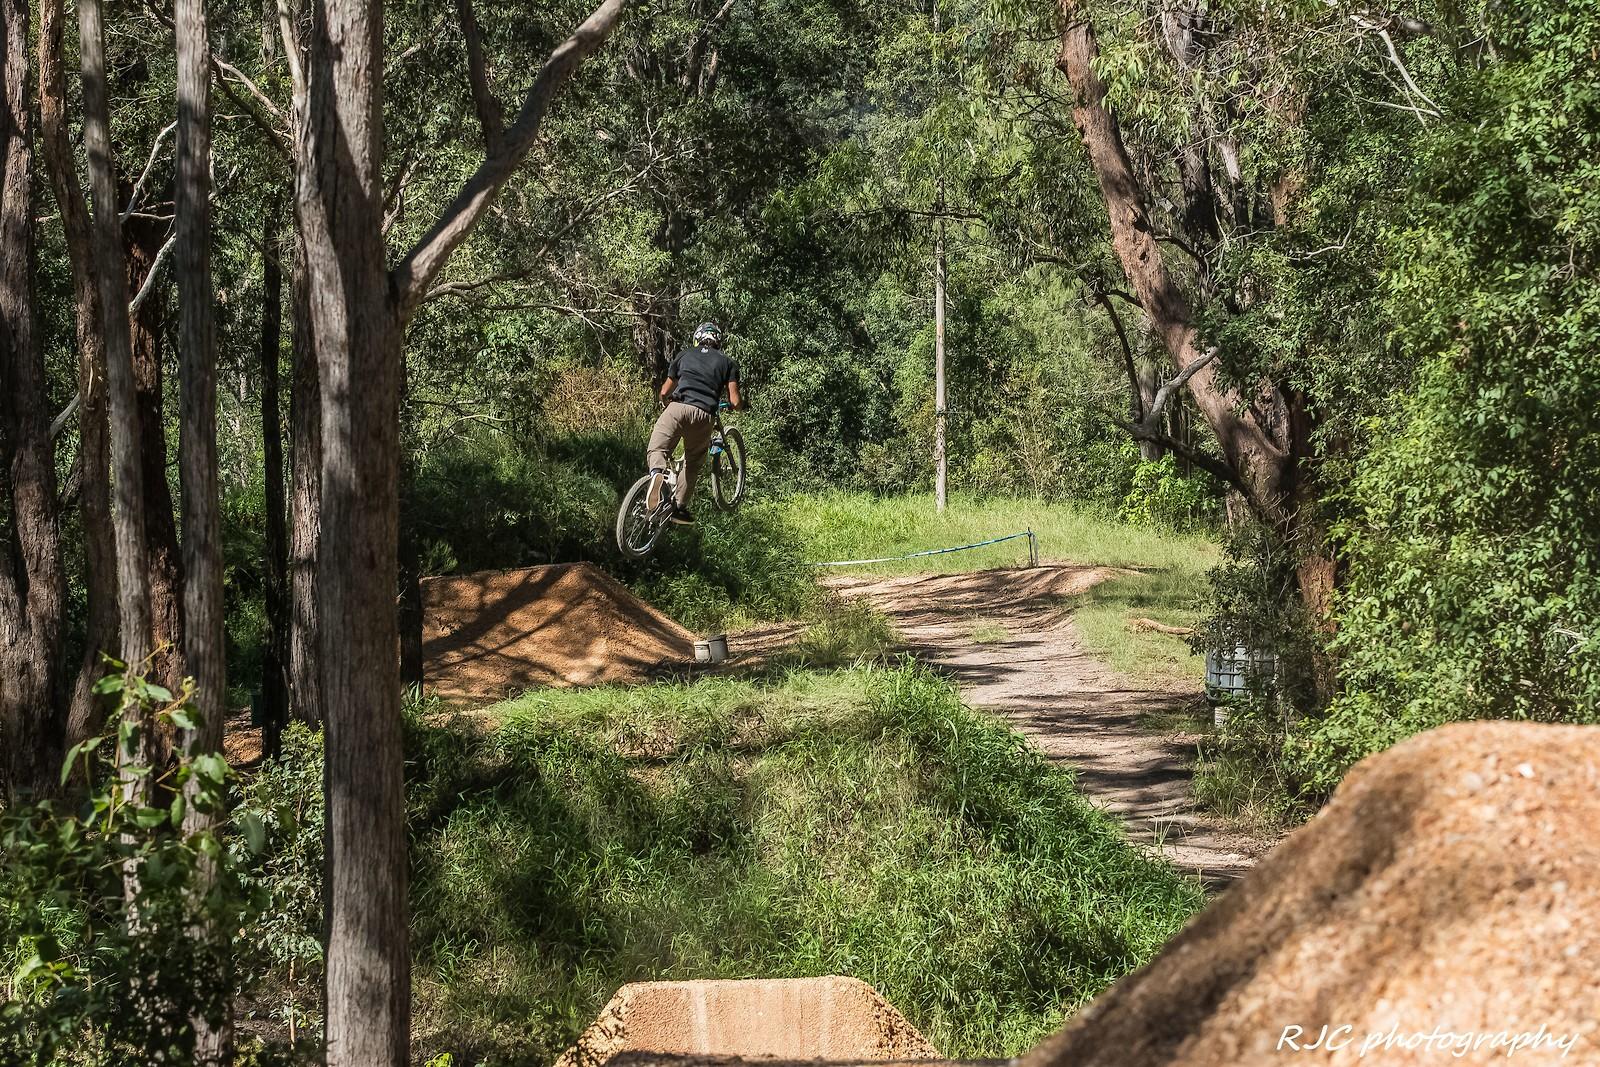 50' nac - blk_zach - Mountain Biking Pictures - Vital MTB